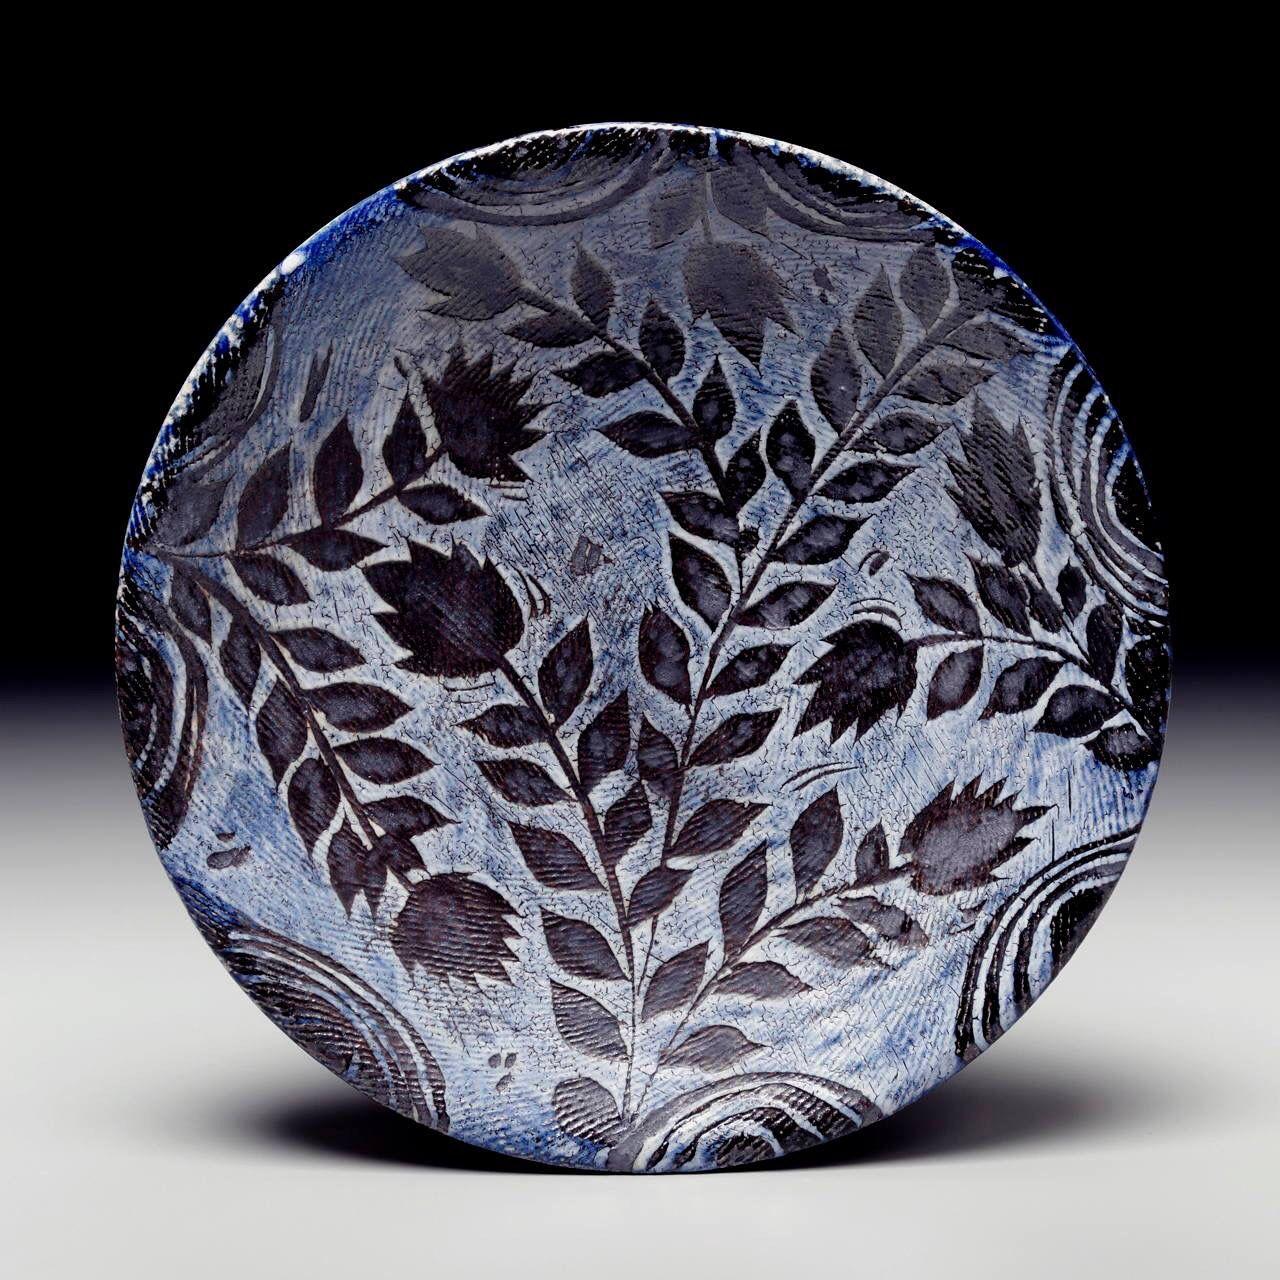 Michael Klein Ceramic Art Ceramics Pottery Techniques